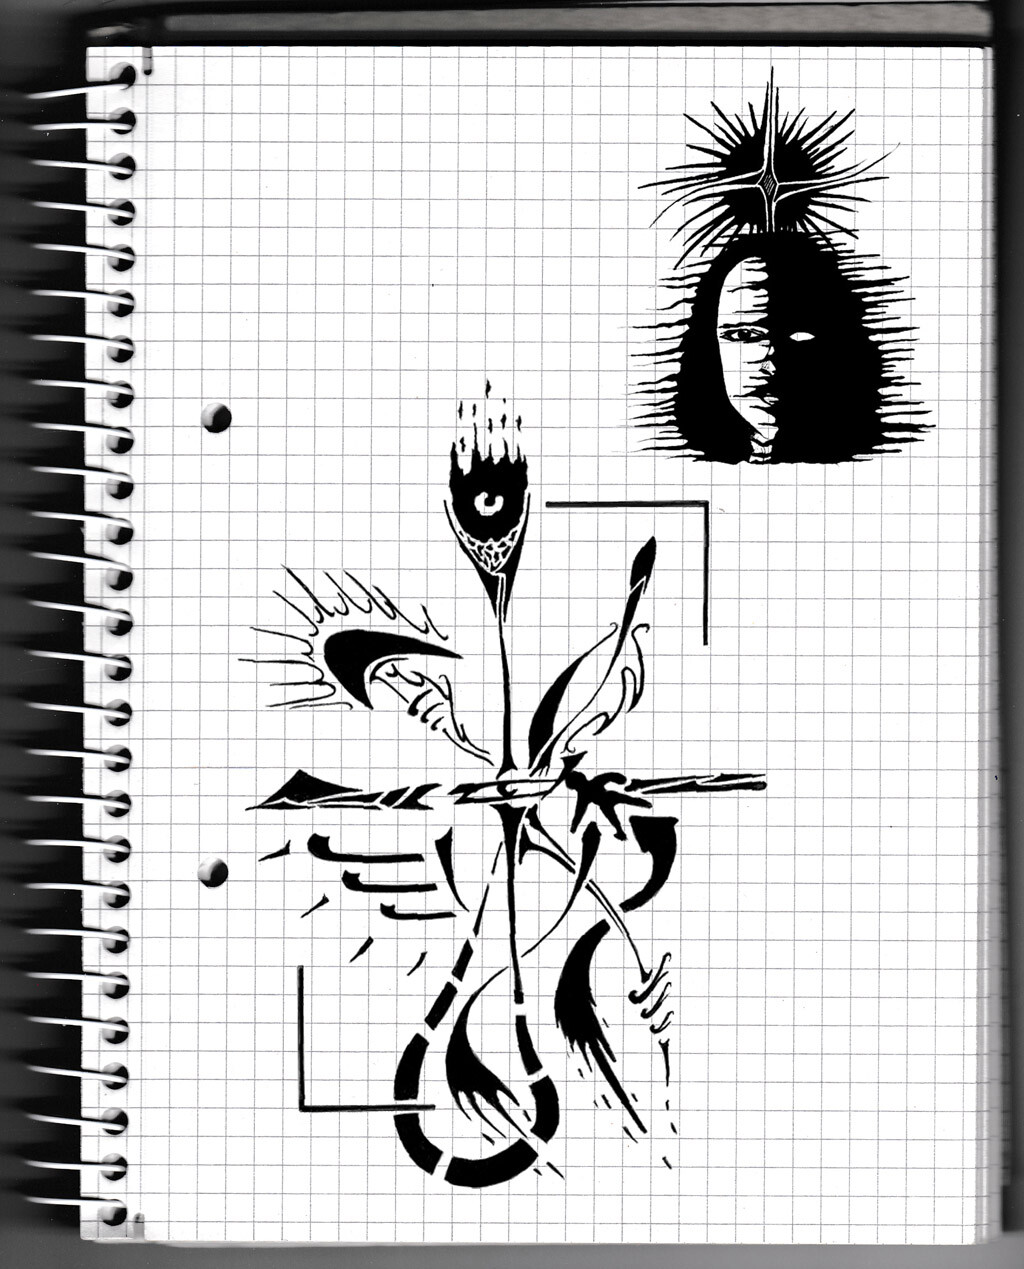 character, sketch, pencil, psychodelic,